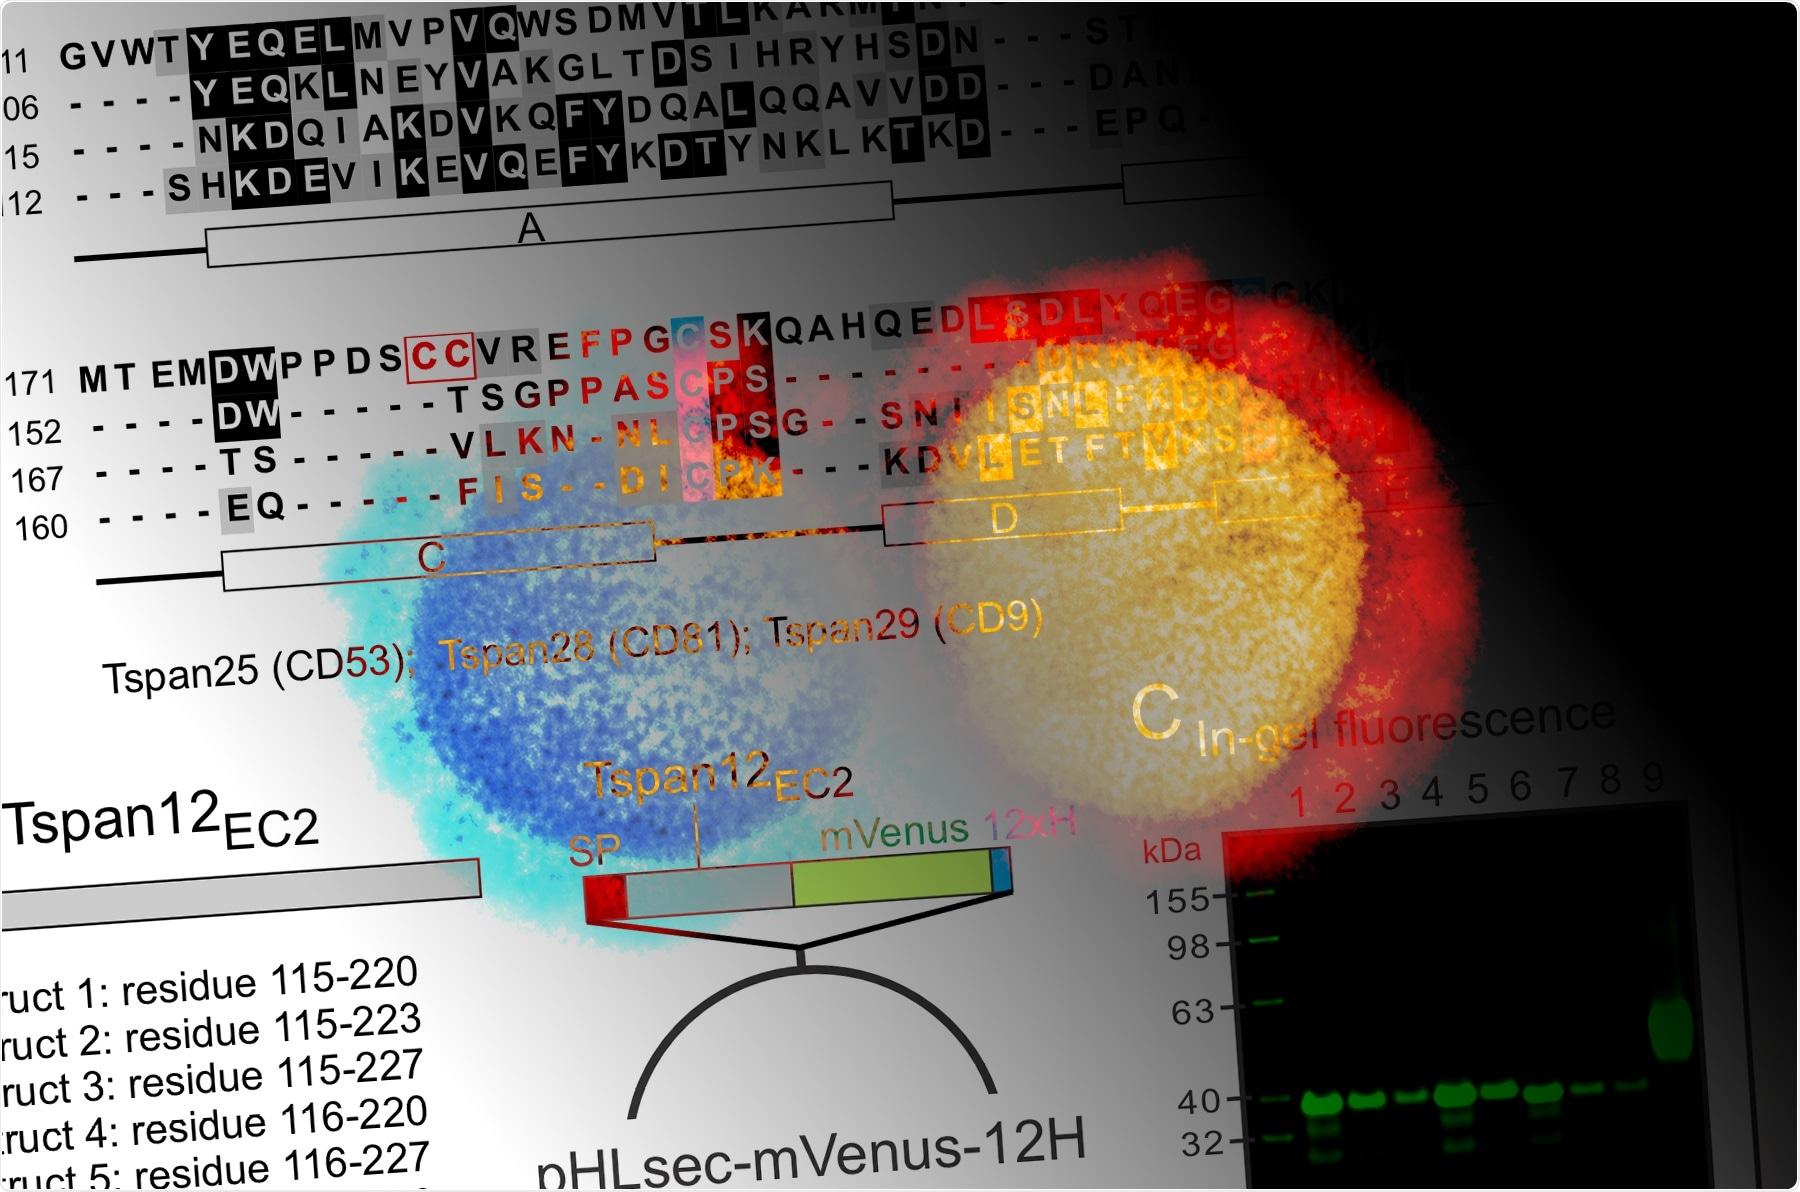 Study: Antibody Display of cell surface receptor Tetraspanin12 and SARS-CoV-2 spike protein